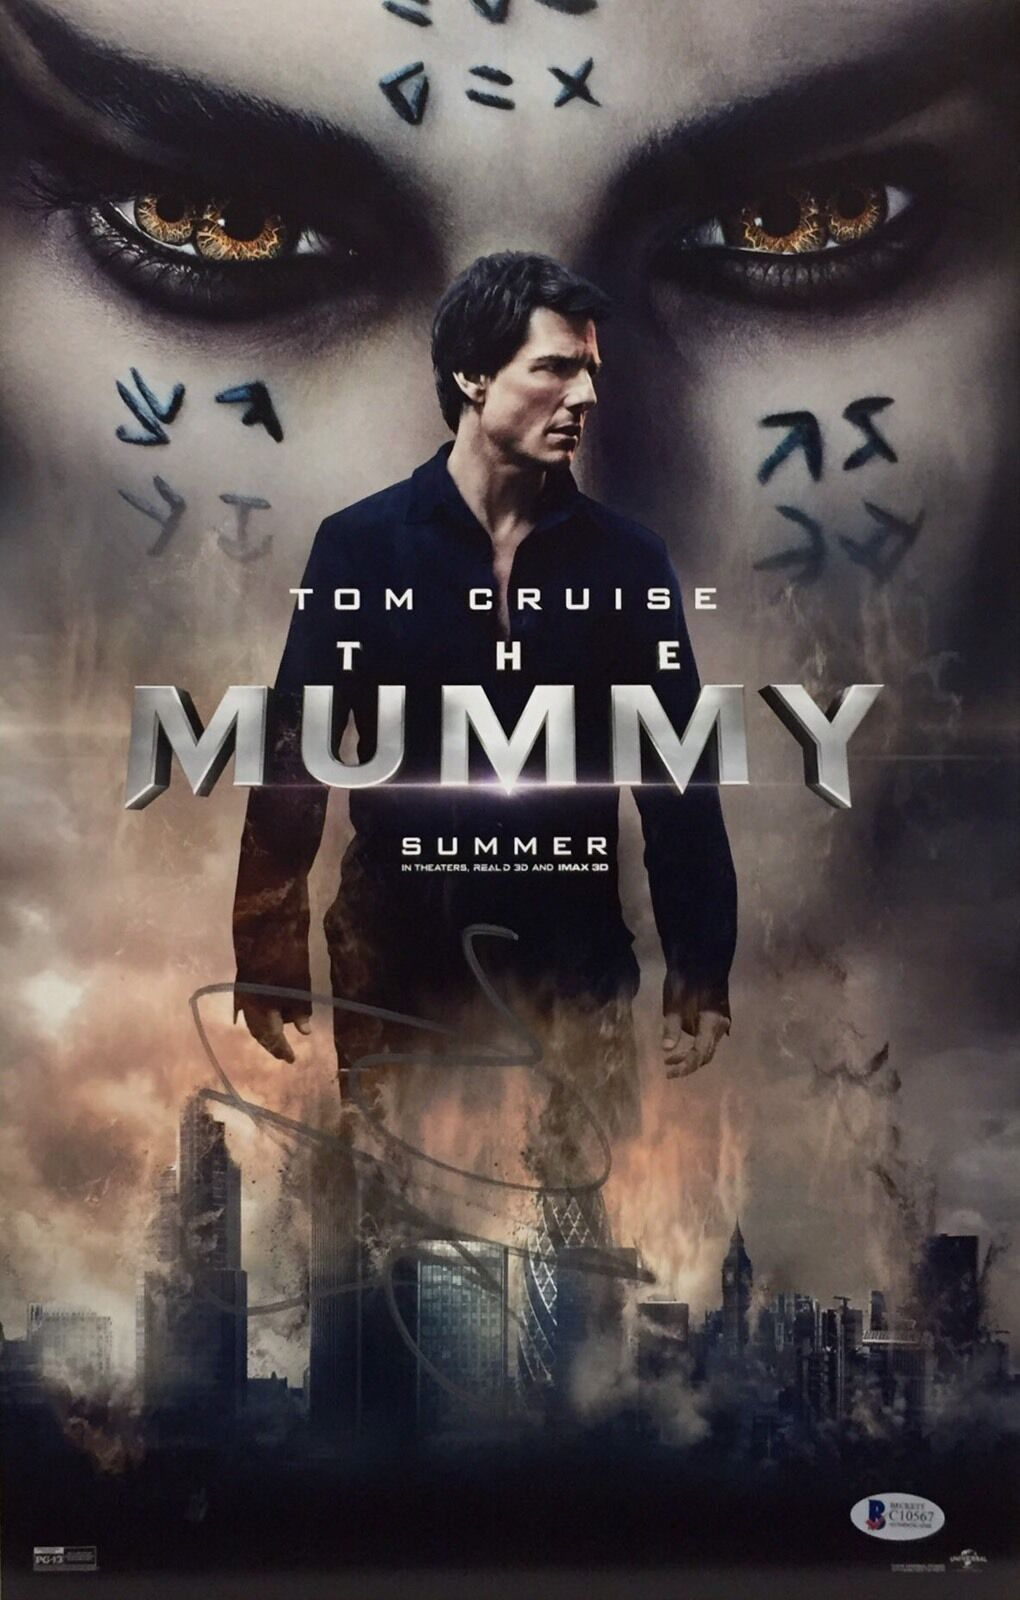 Sofia Boutella Signed 11x17 The Mummy Poster/Photo Beckett BAS